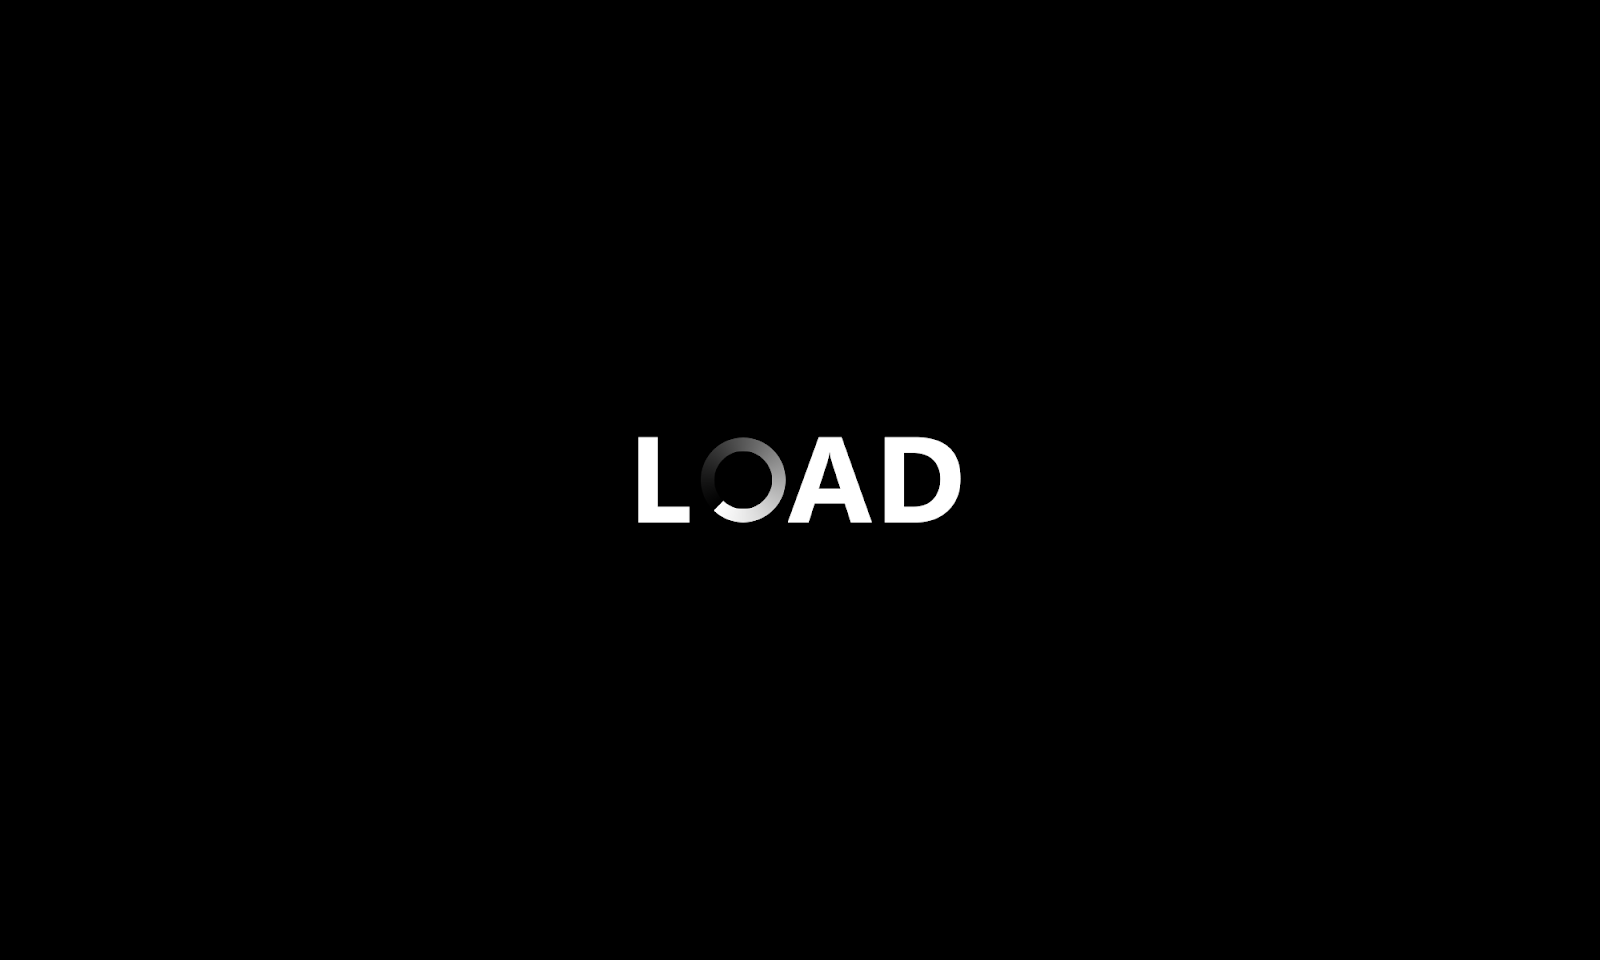 Load Text Creative Logo Inspiration